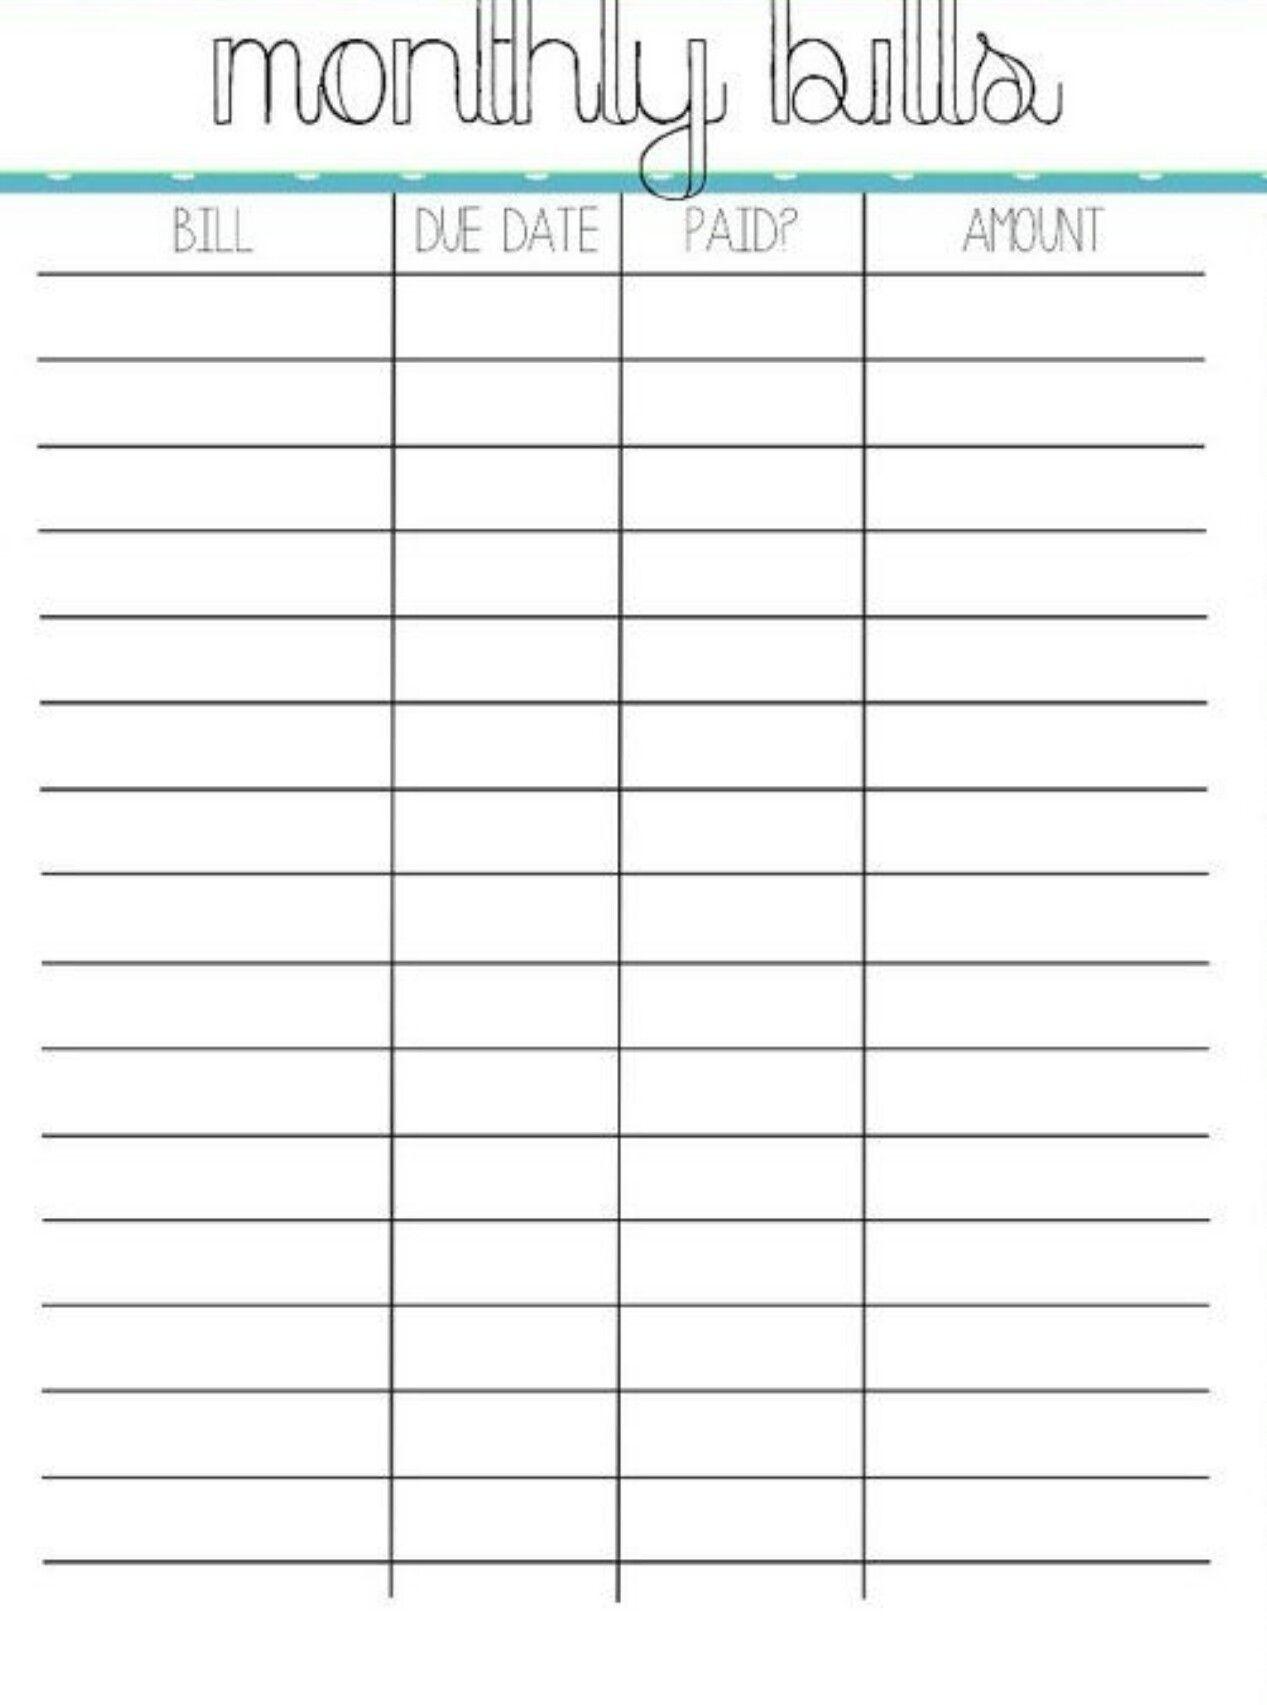 Pincrystal On Bills | Bill Organization, Organizing Monthly inside Monthly Bill Calendar Template Printable